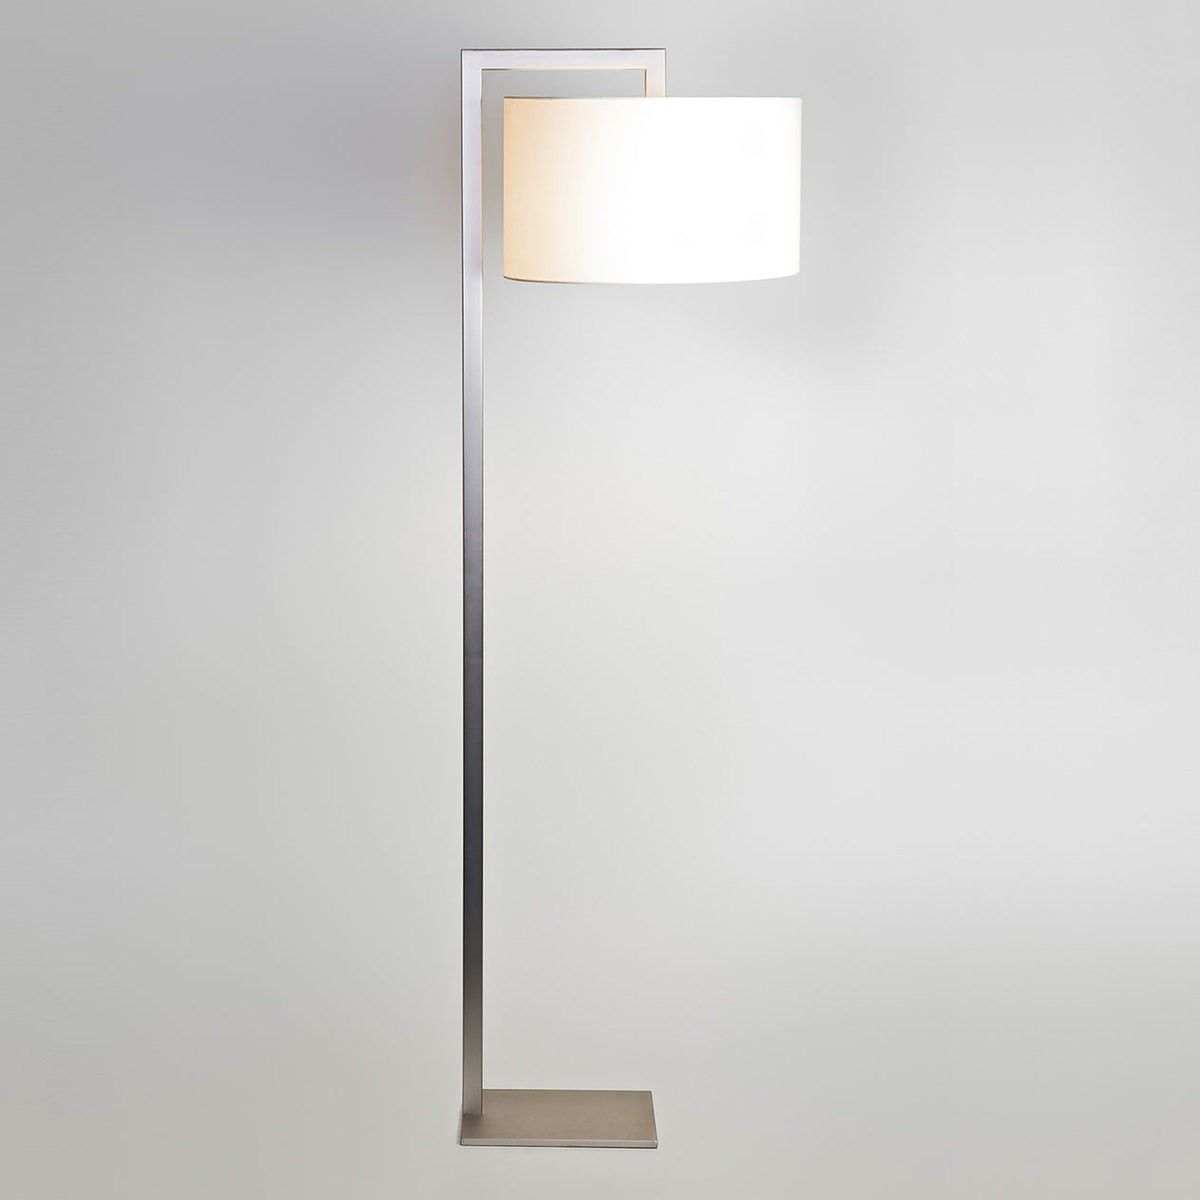 Astro Ravello Matt Nickel Floor Lamp With Black Large Drum Shade Modern Floor Lamps